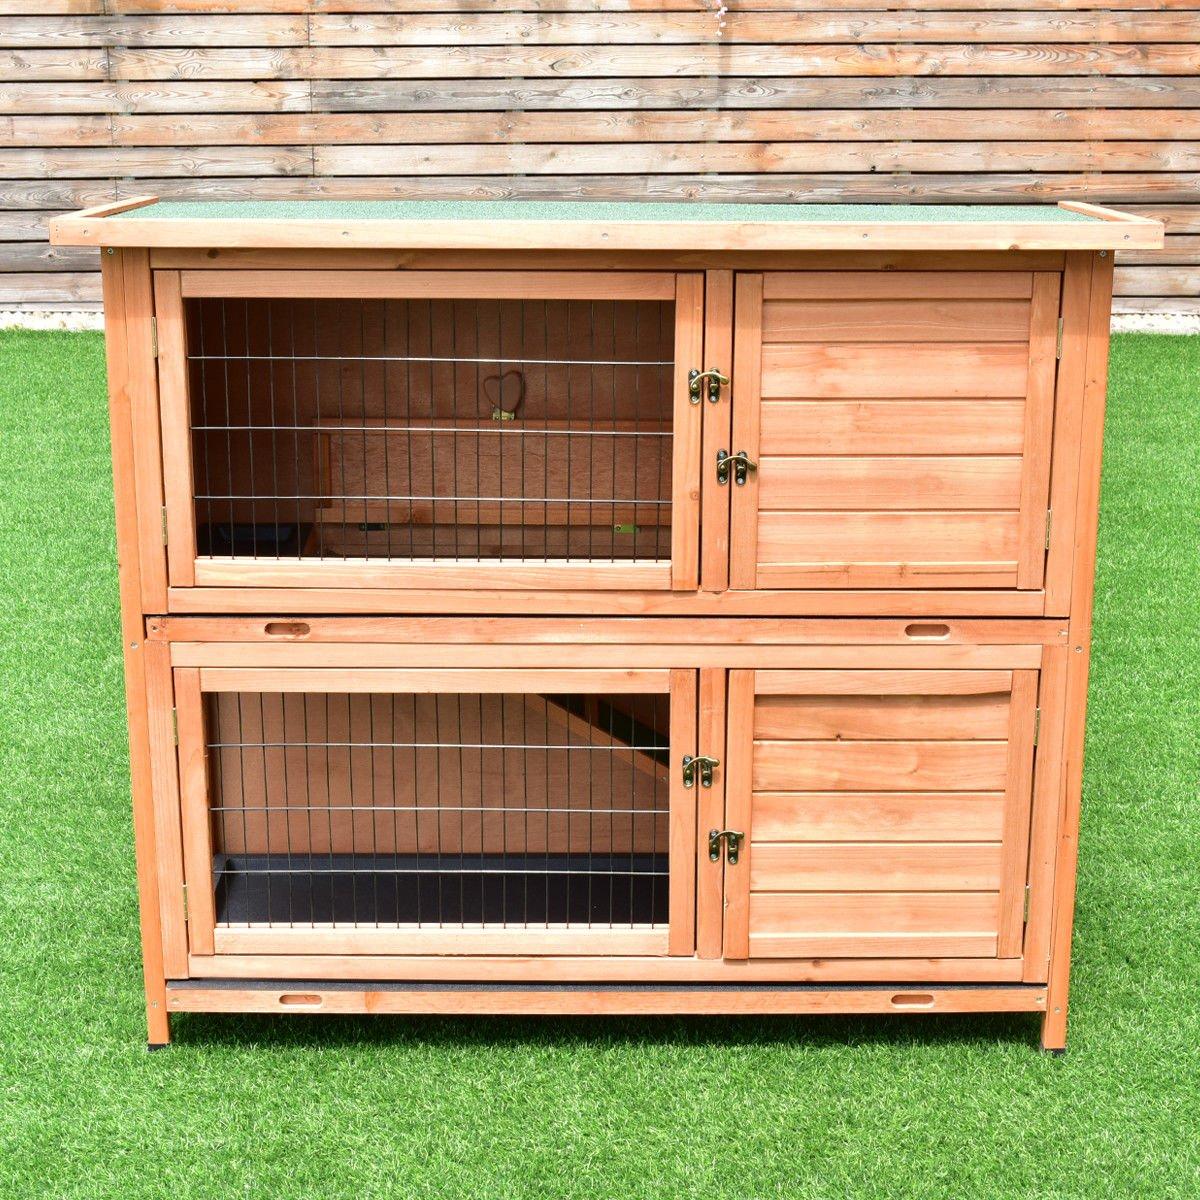 Tangkula Chicken Coop 48'' Rabbit Hutch Wooden Garden Backyard Bunny Hen House Pet Supplies with Ladder by Tangkula (Image #3)